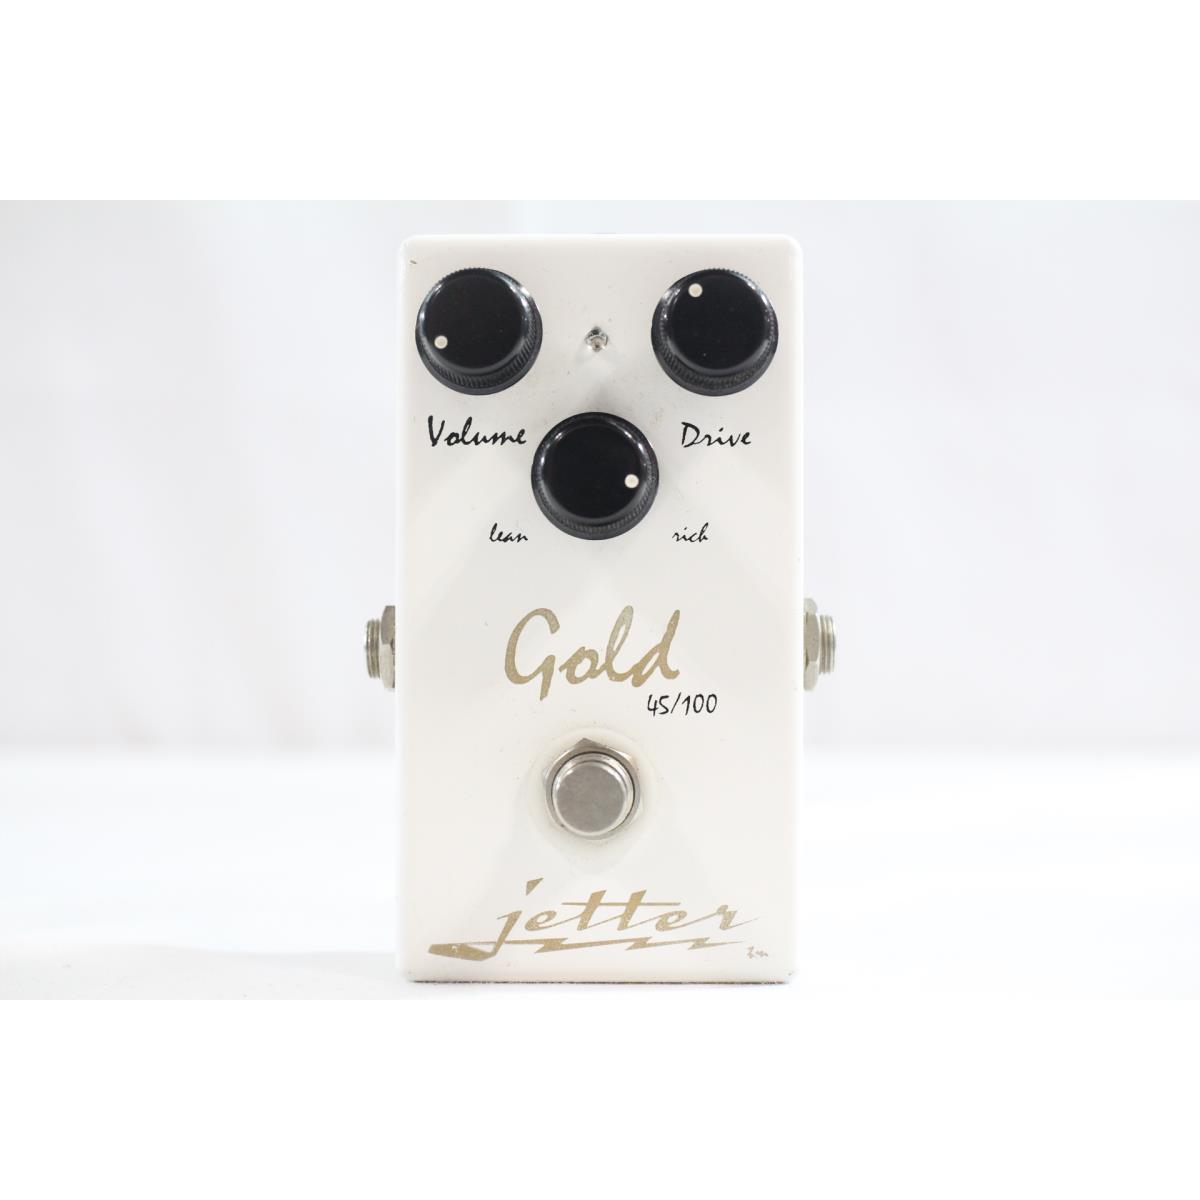 JETTER GEAR GOLD45 大注目 中古 100 再入荷/予約販売!